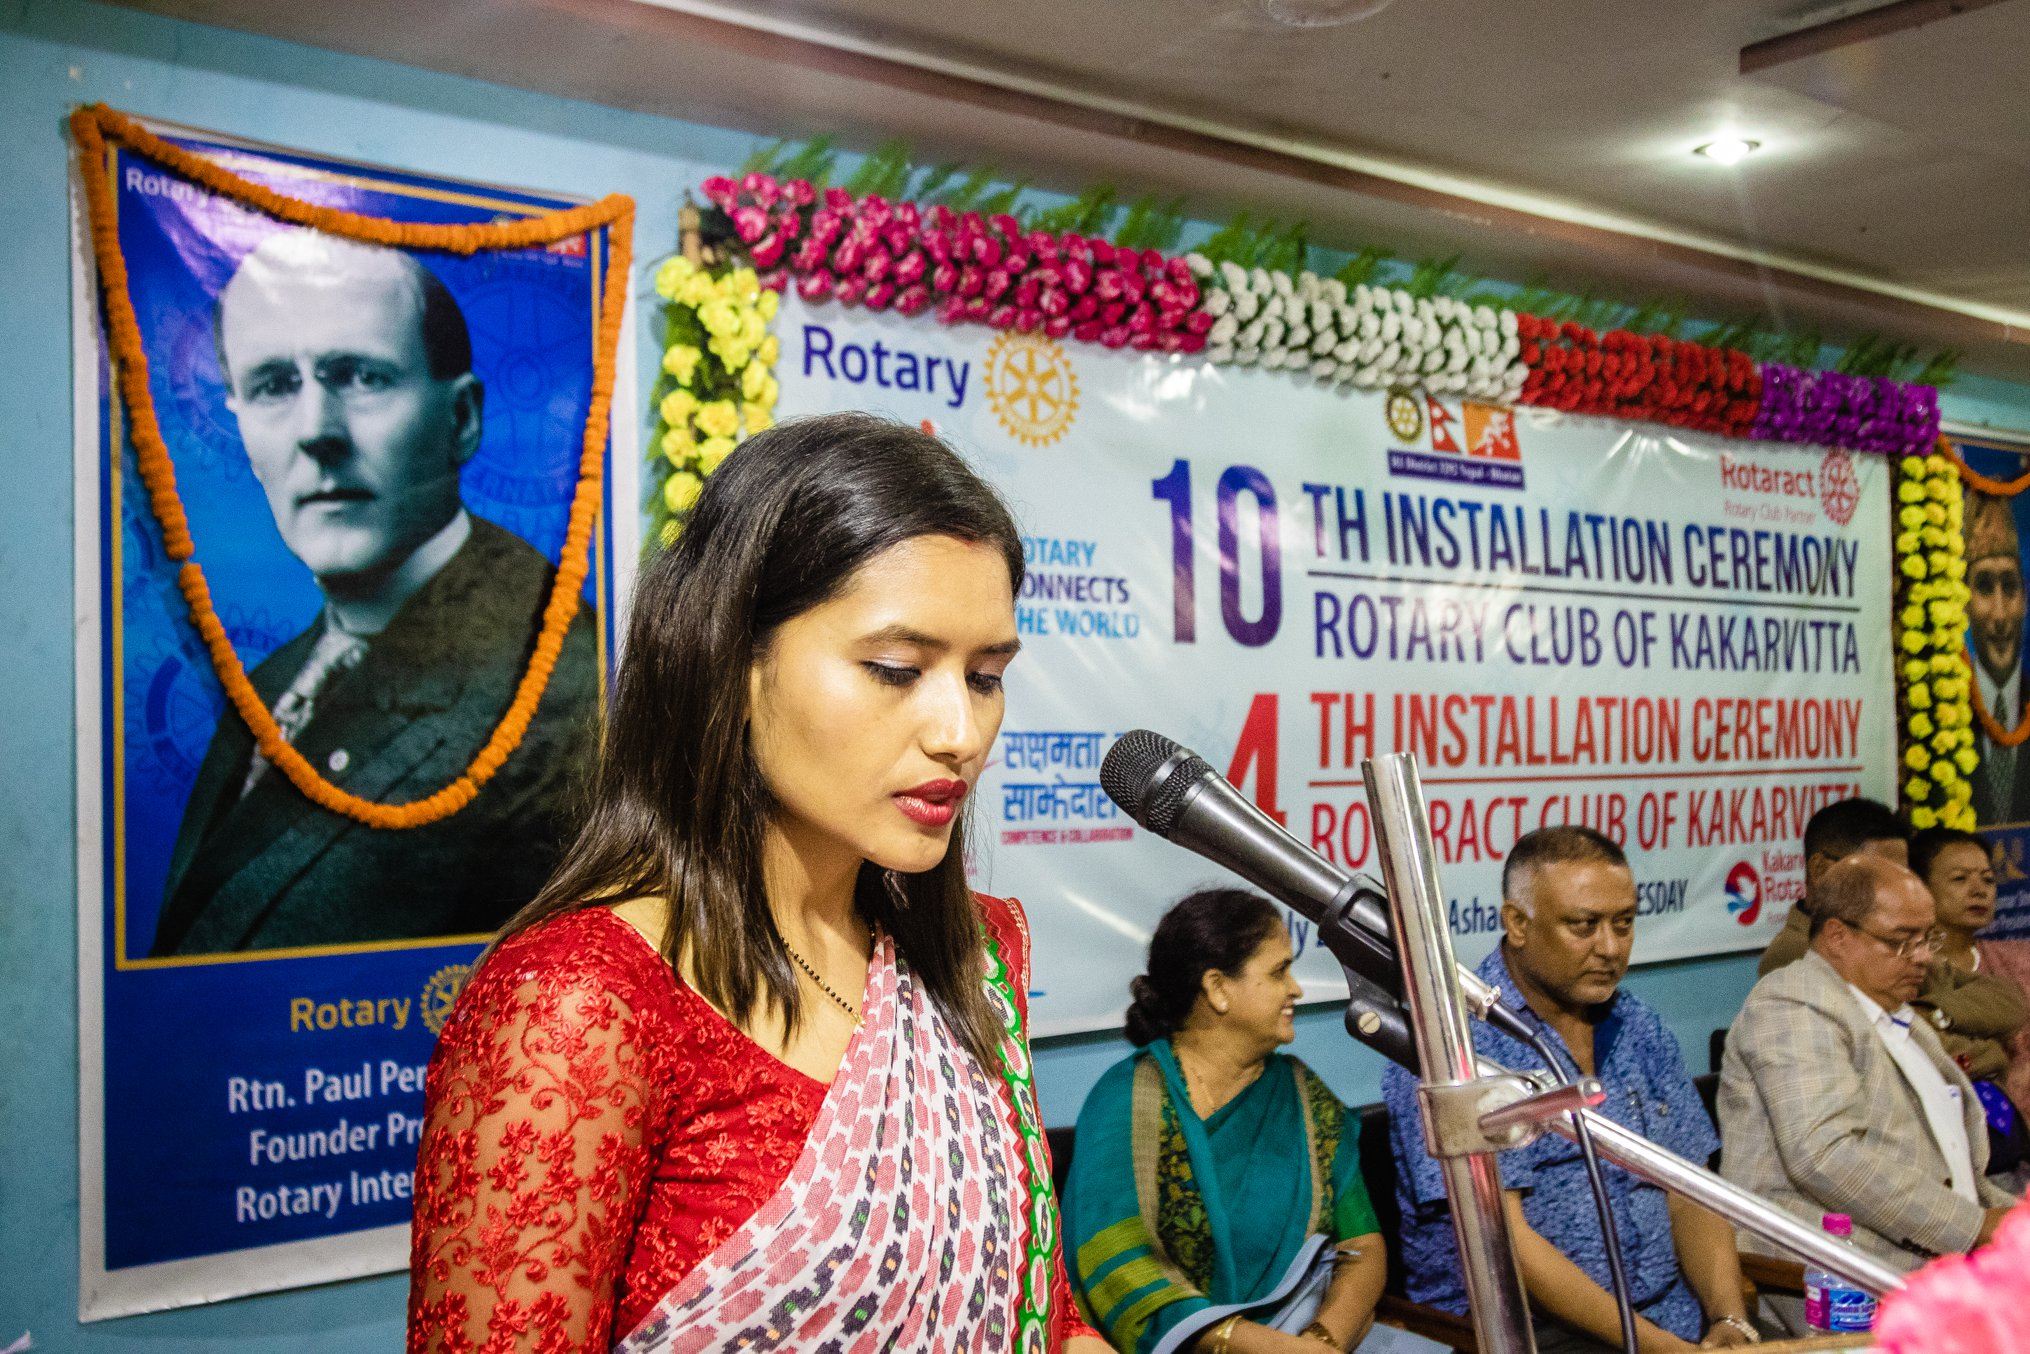 10th Installation Ceremony Rotary Club Of Kakarvitta 66